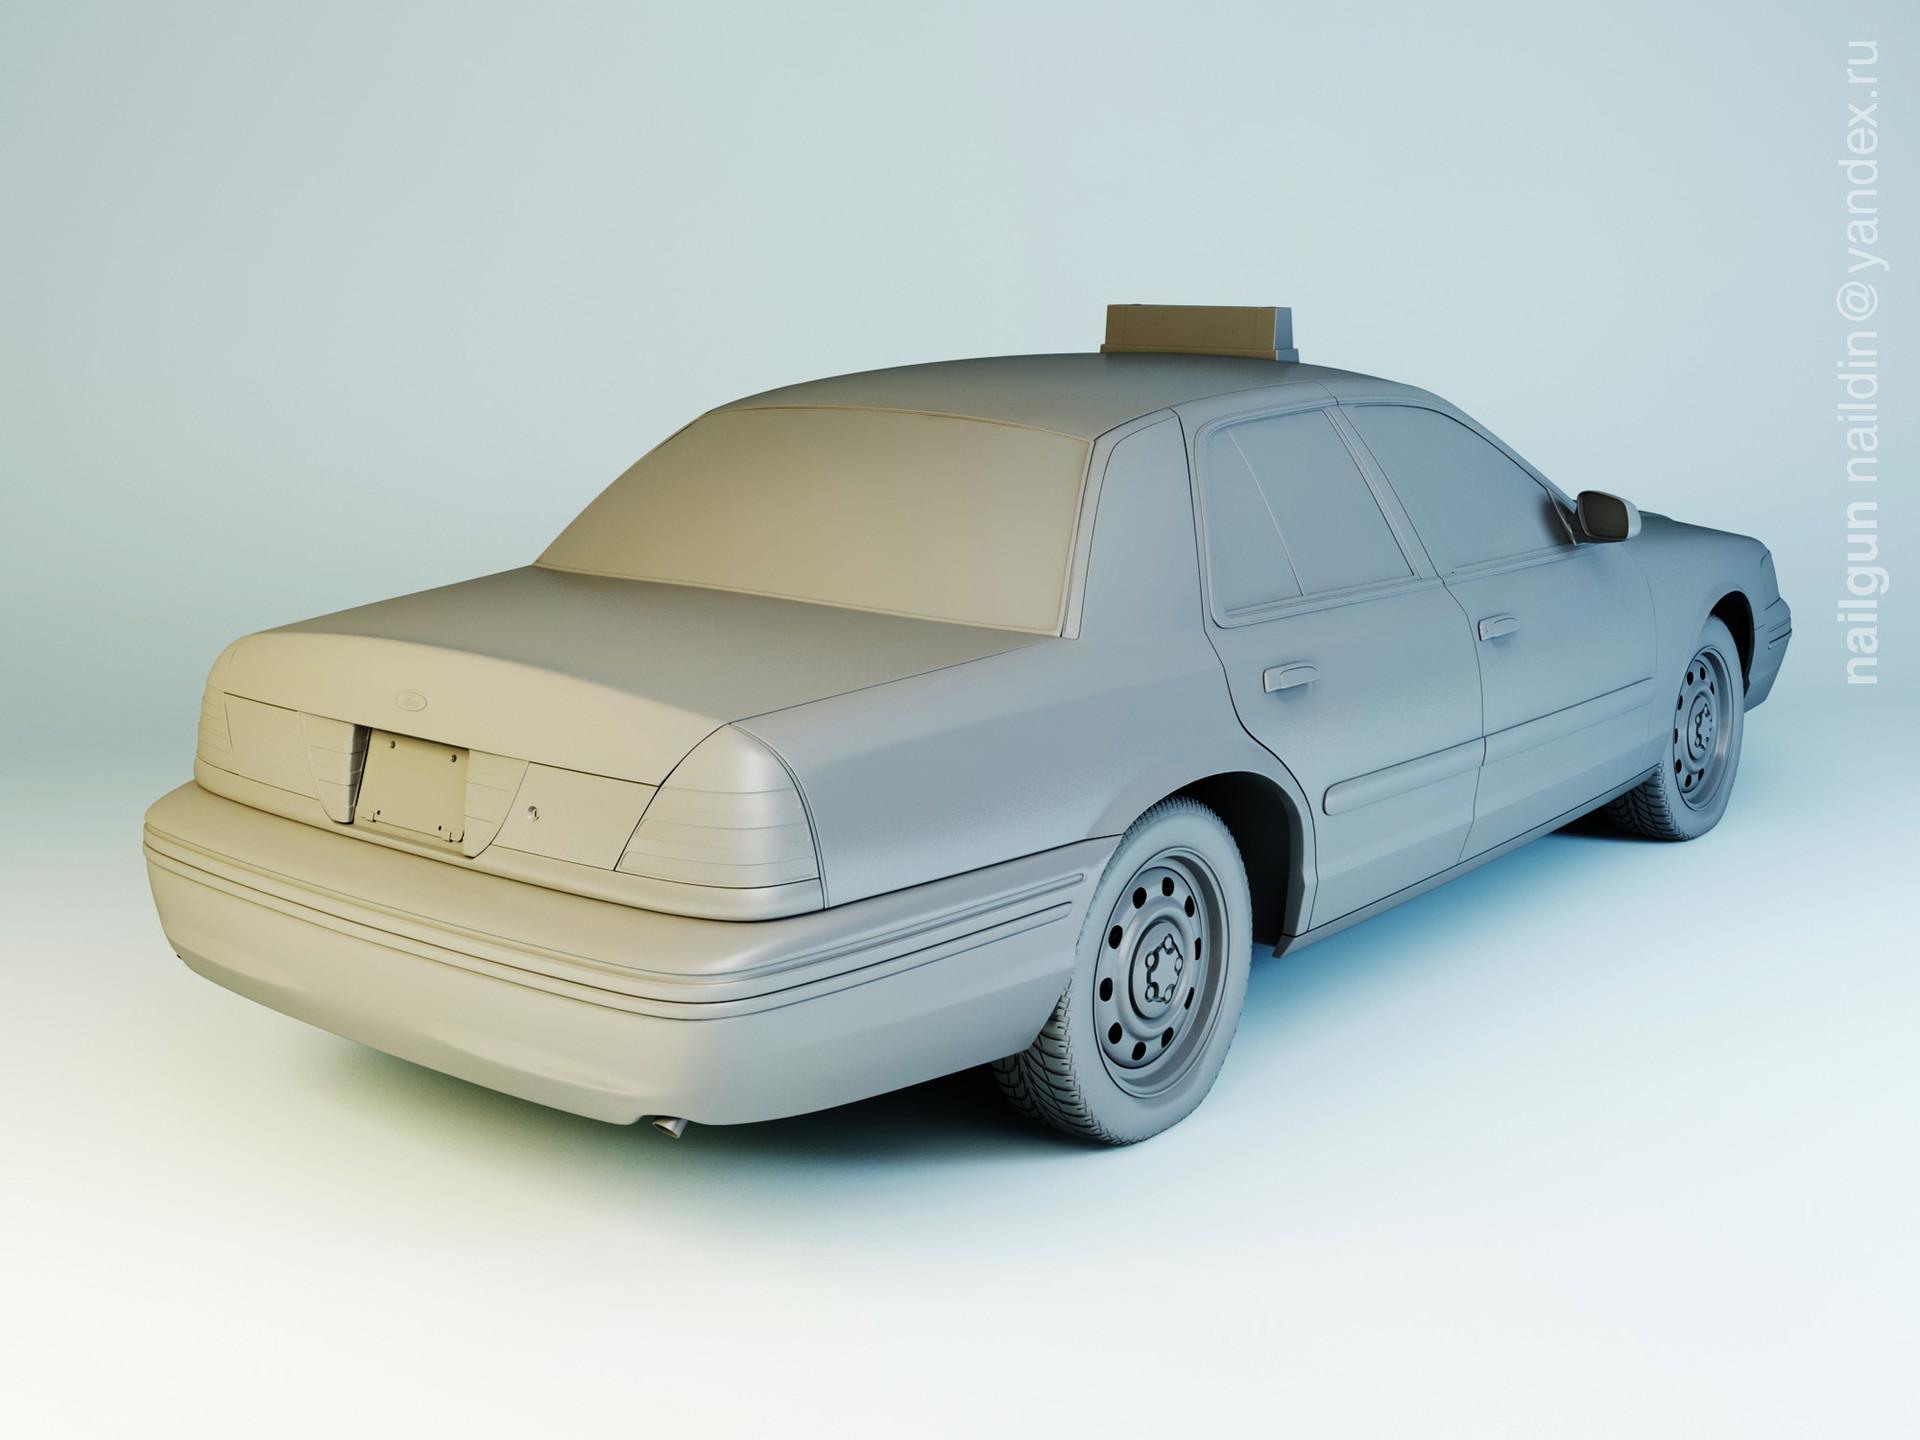 Nail khusnutdinov 003 ford cv modelling 1